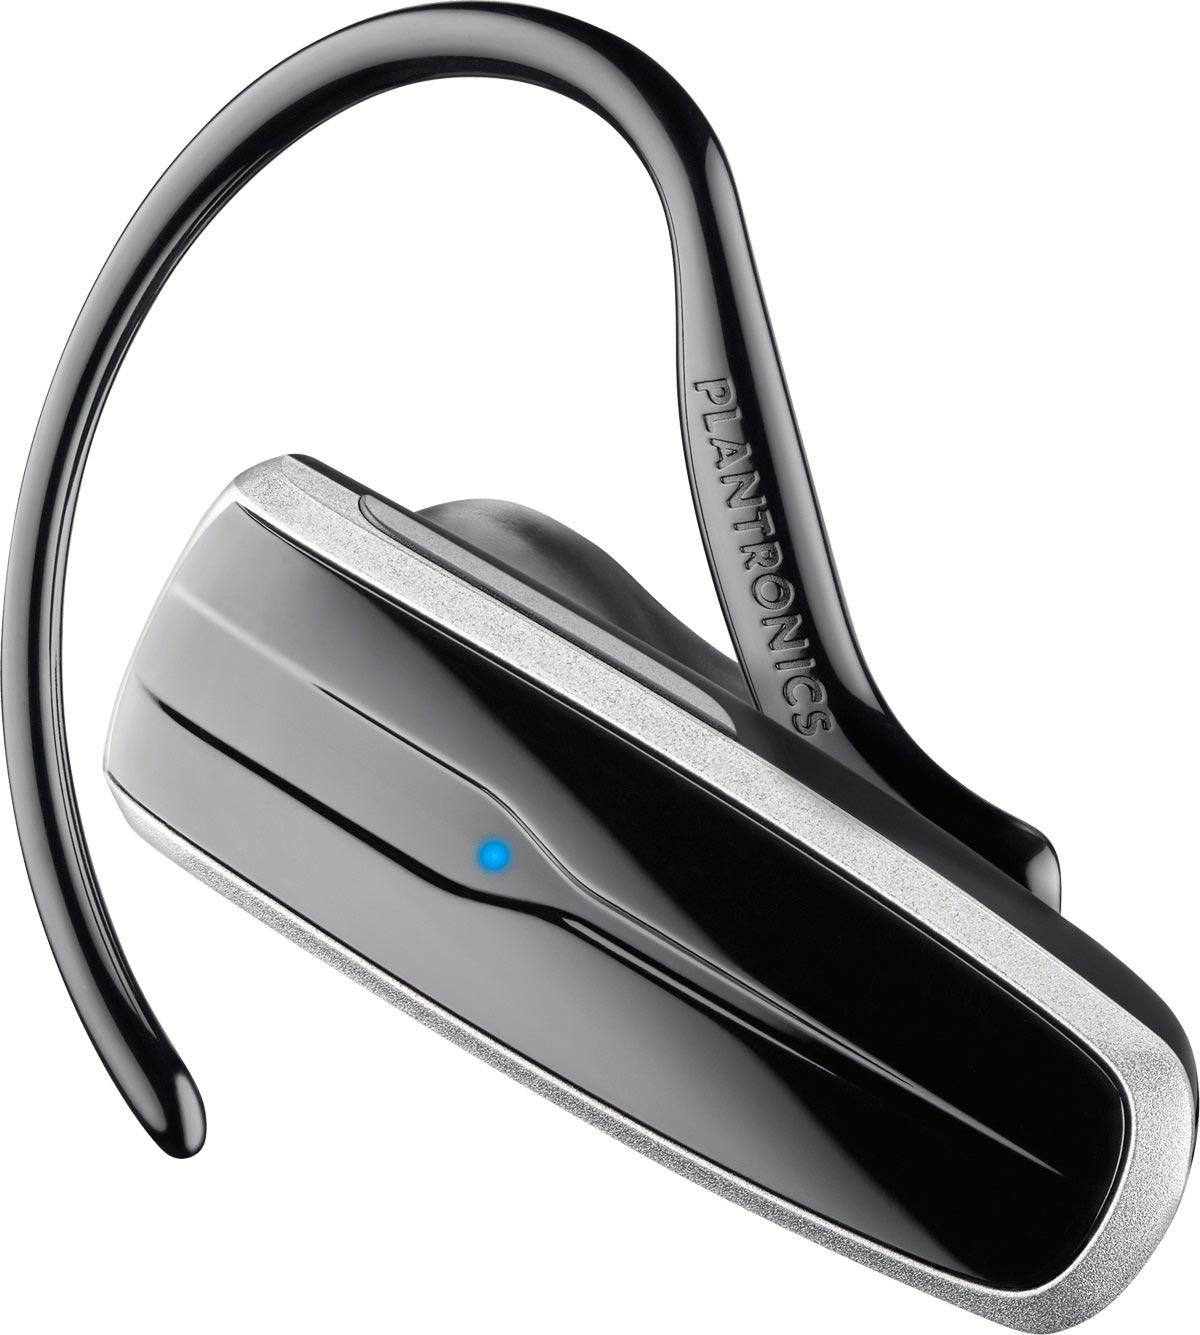 Plantronics Explorer 240 Bluetooth Headset Price In Pakistan